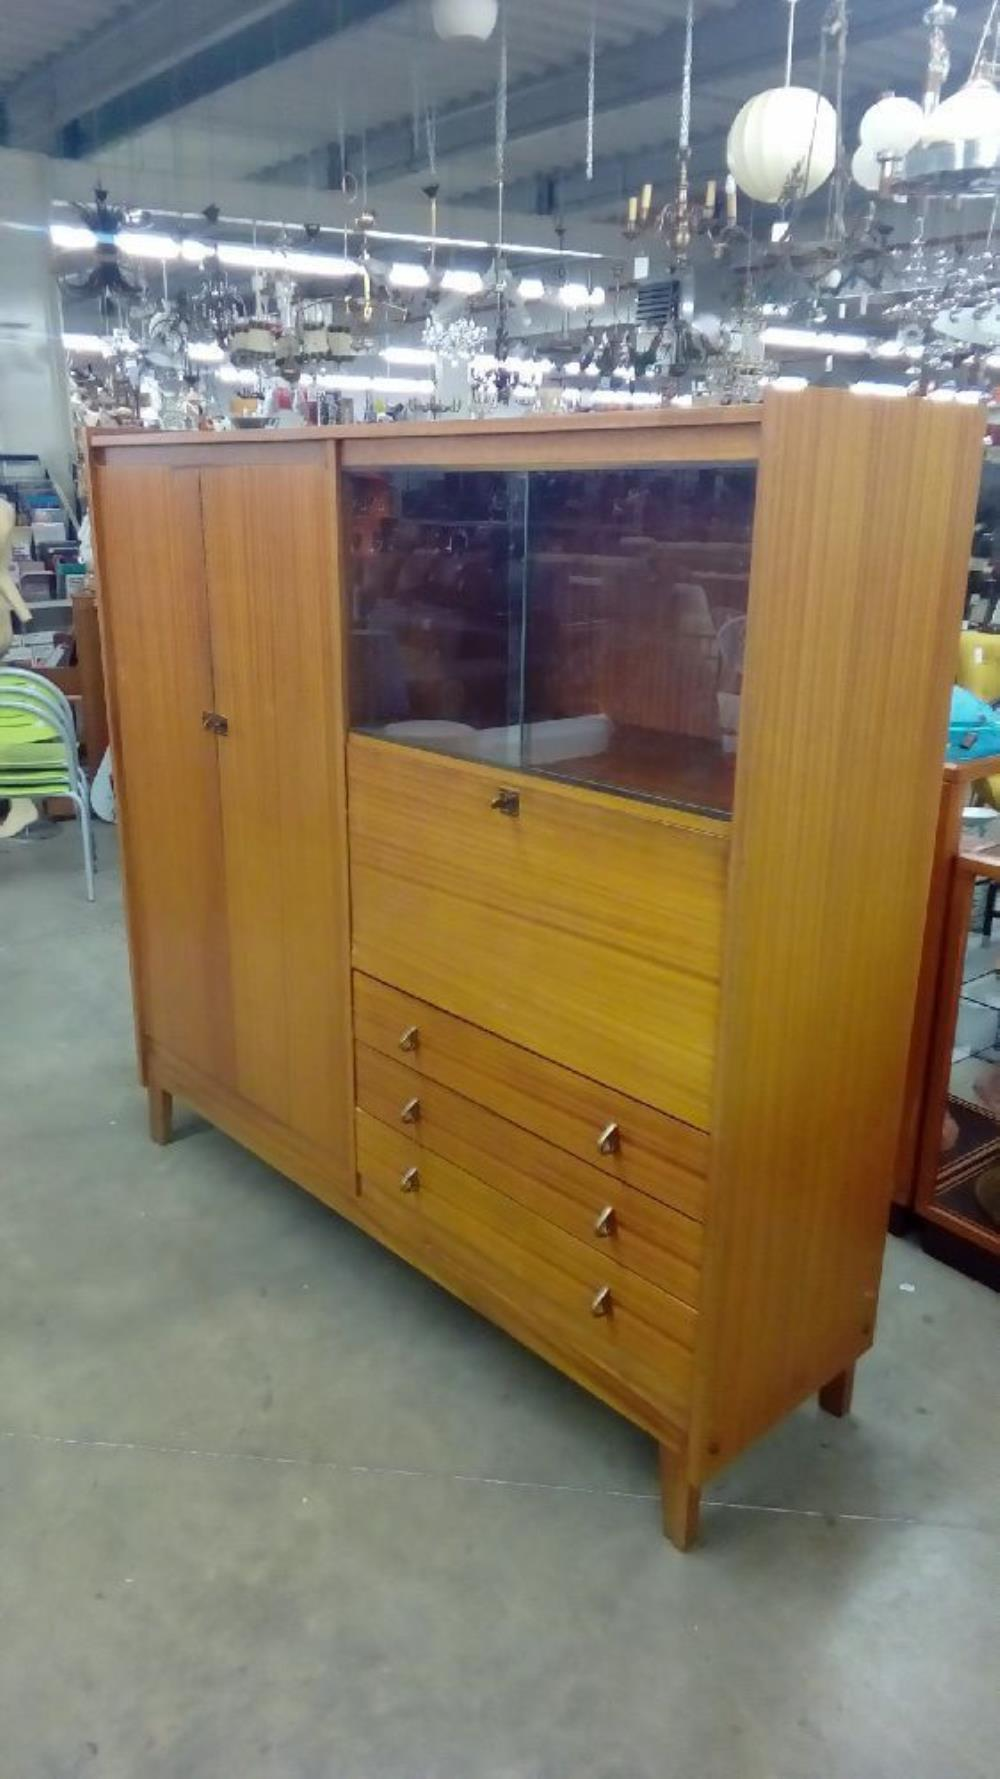 meuble secr taire 1960 occasion troc nancy. Black Bedroom Furniture Sets. Home Design Ideas